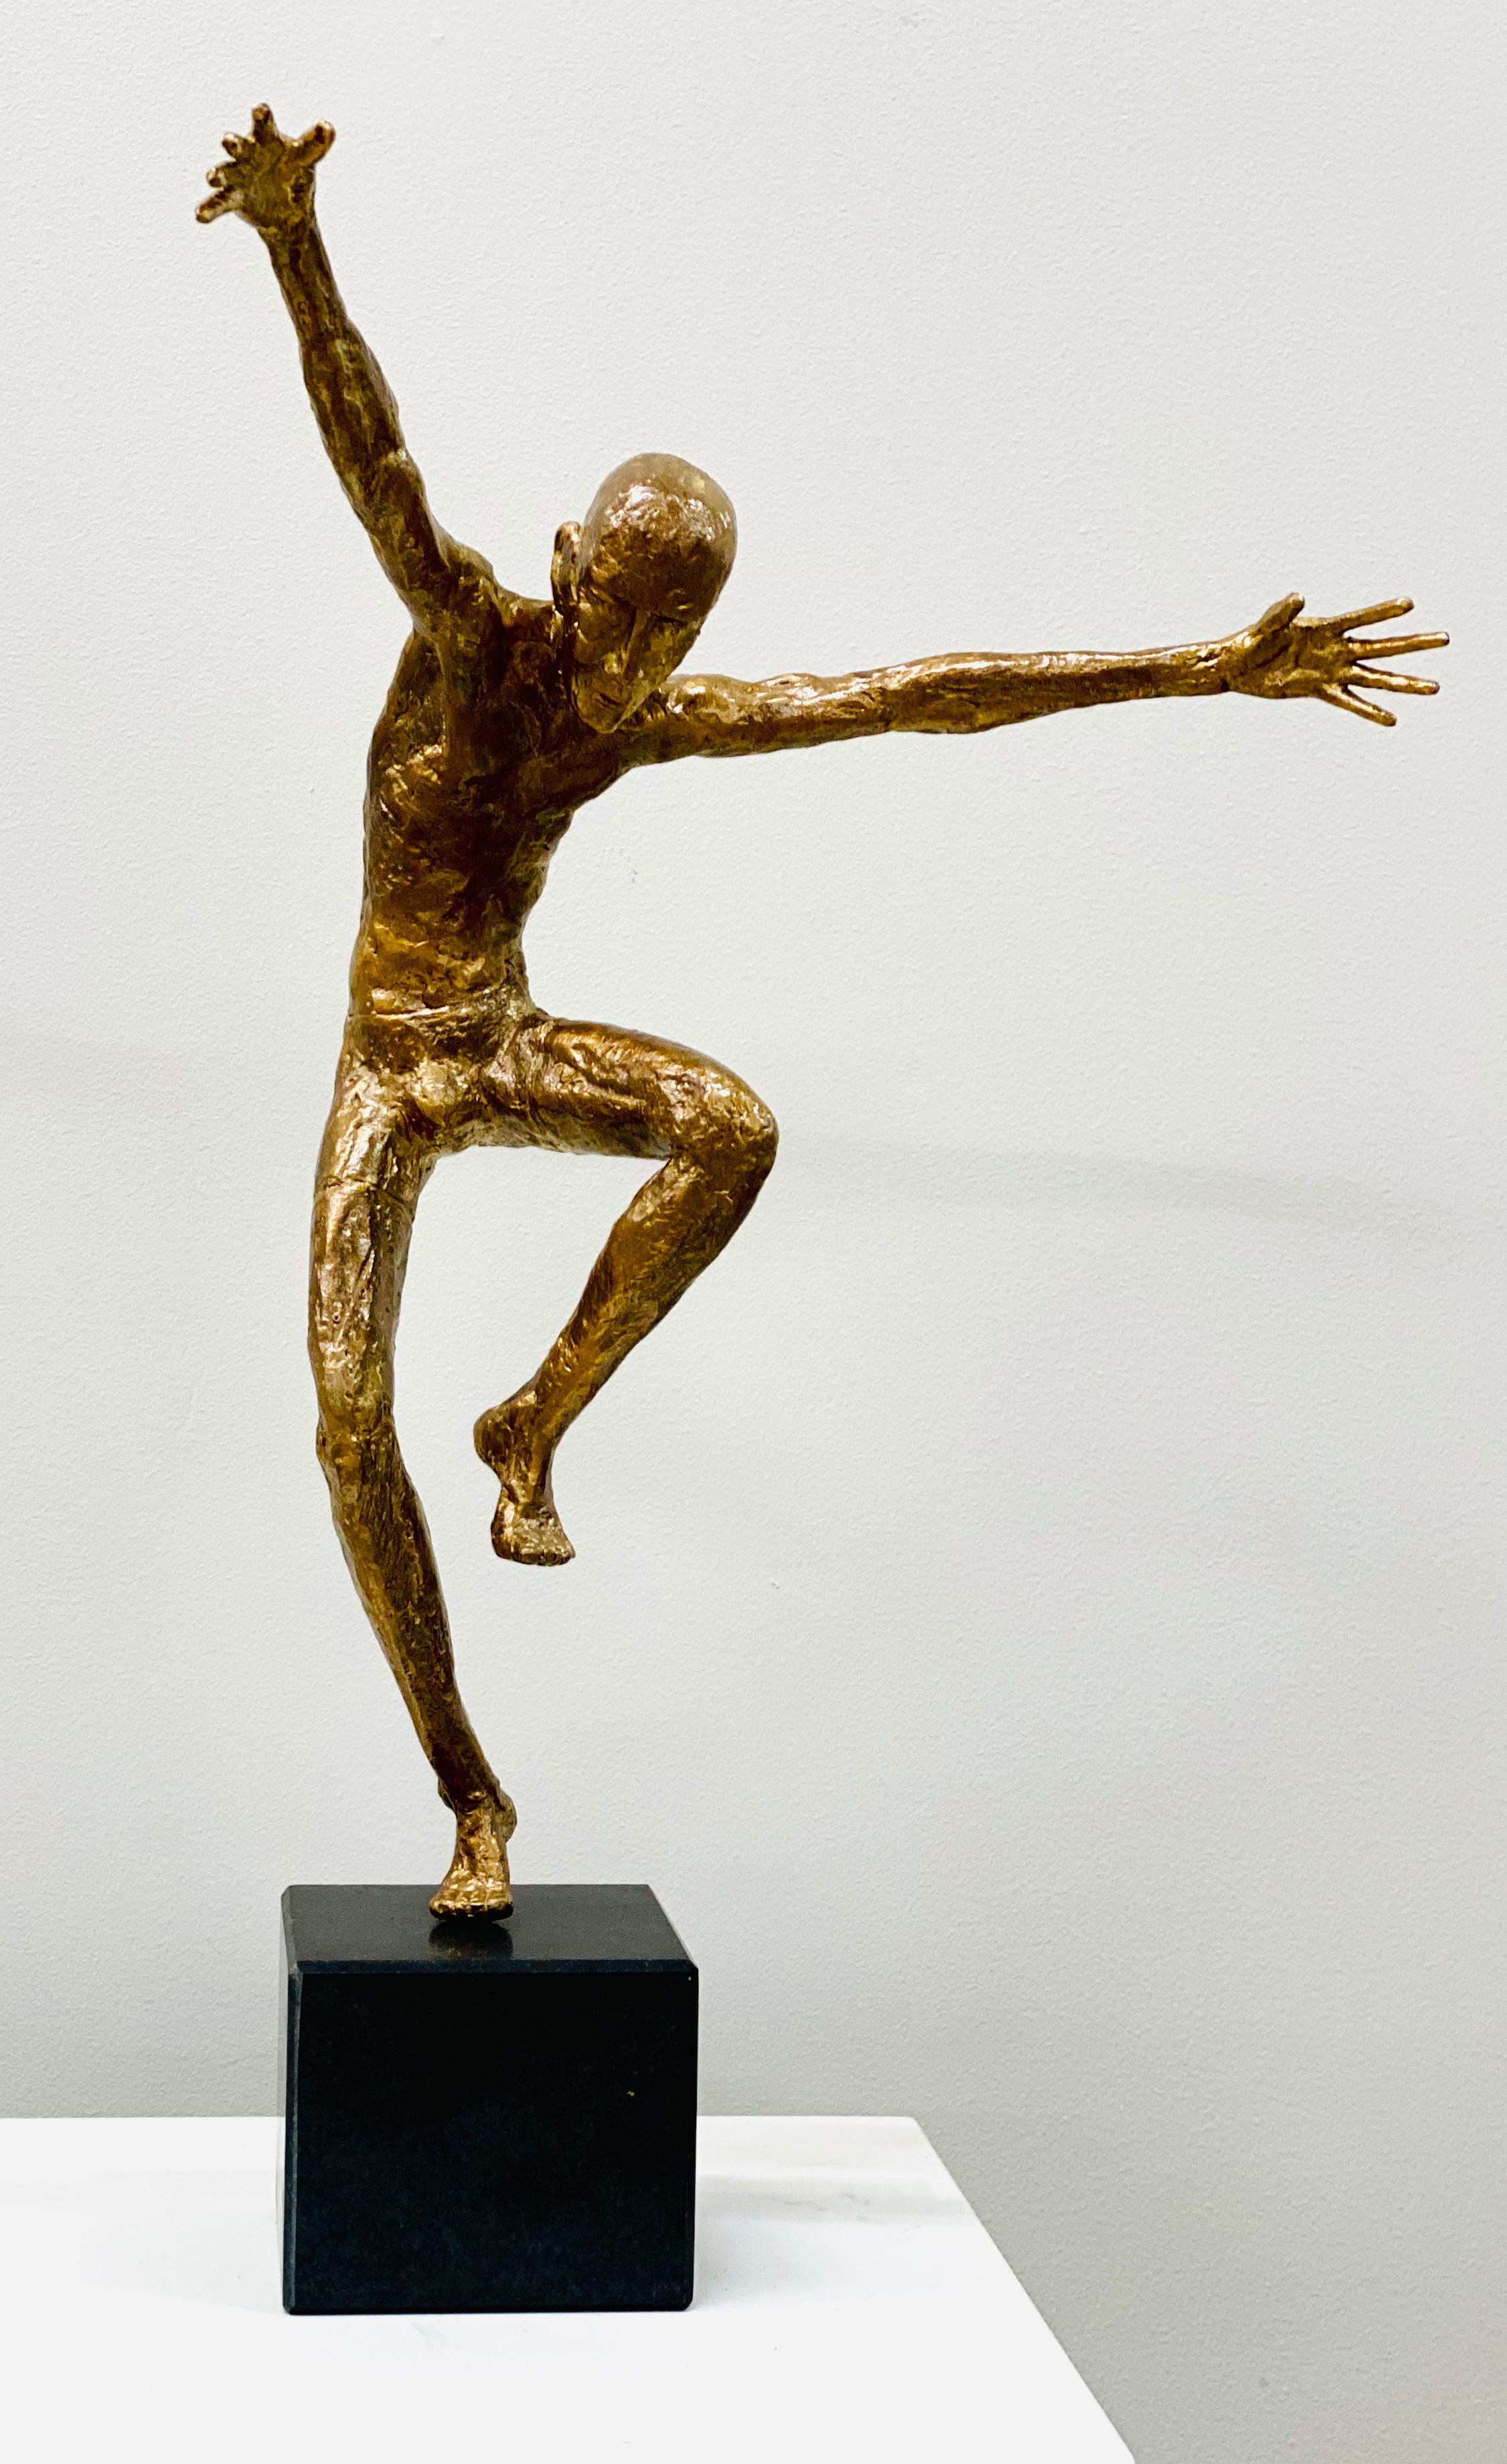 Dancer V- 21st Century Contemporary Bronze Sculpture of a Male Dancer